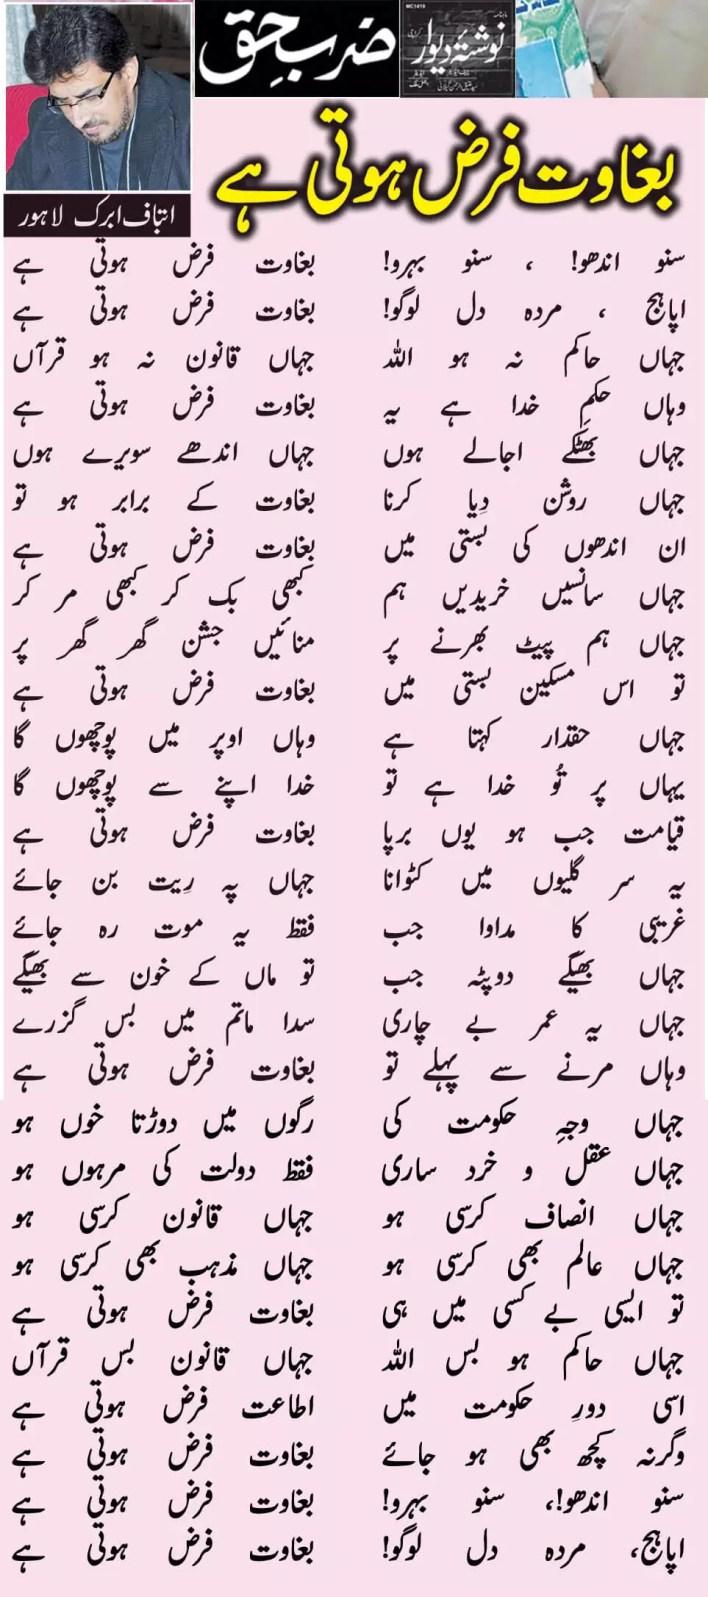 Baghawat-Farz-Hoti-he-Ashaar